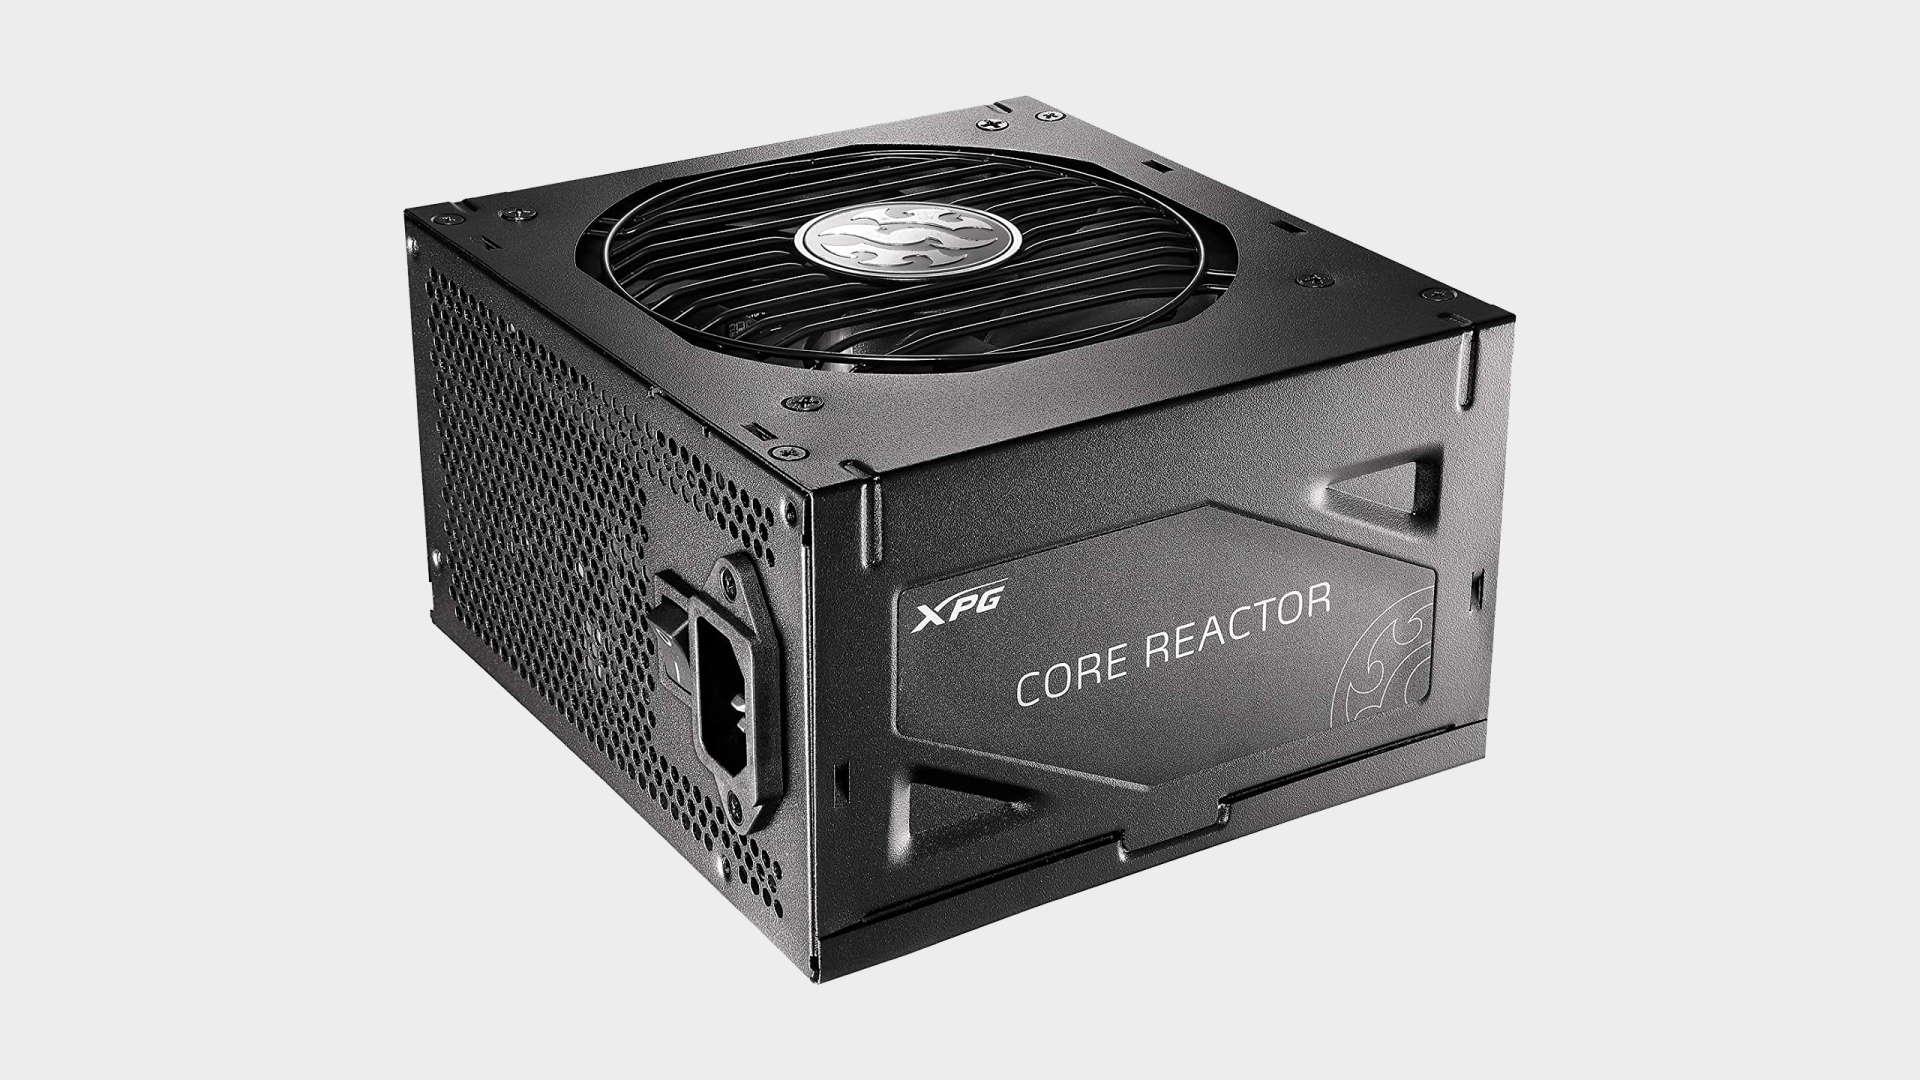 XPG Core Reactor 650W power supply